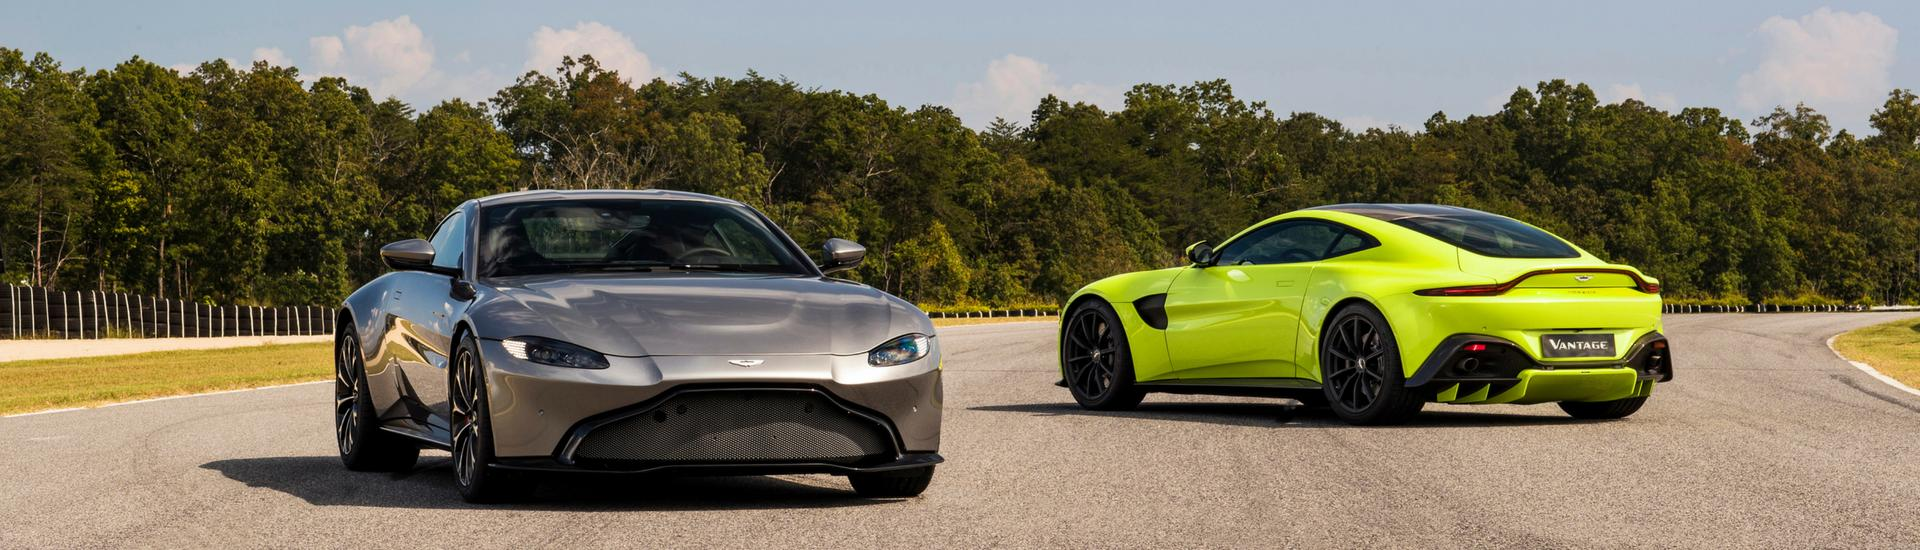 New Aston Martin Vantage Coupe Cars For Sale Carsales Com Au